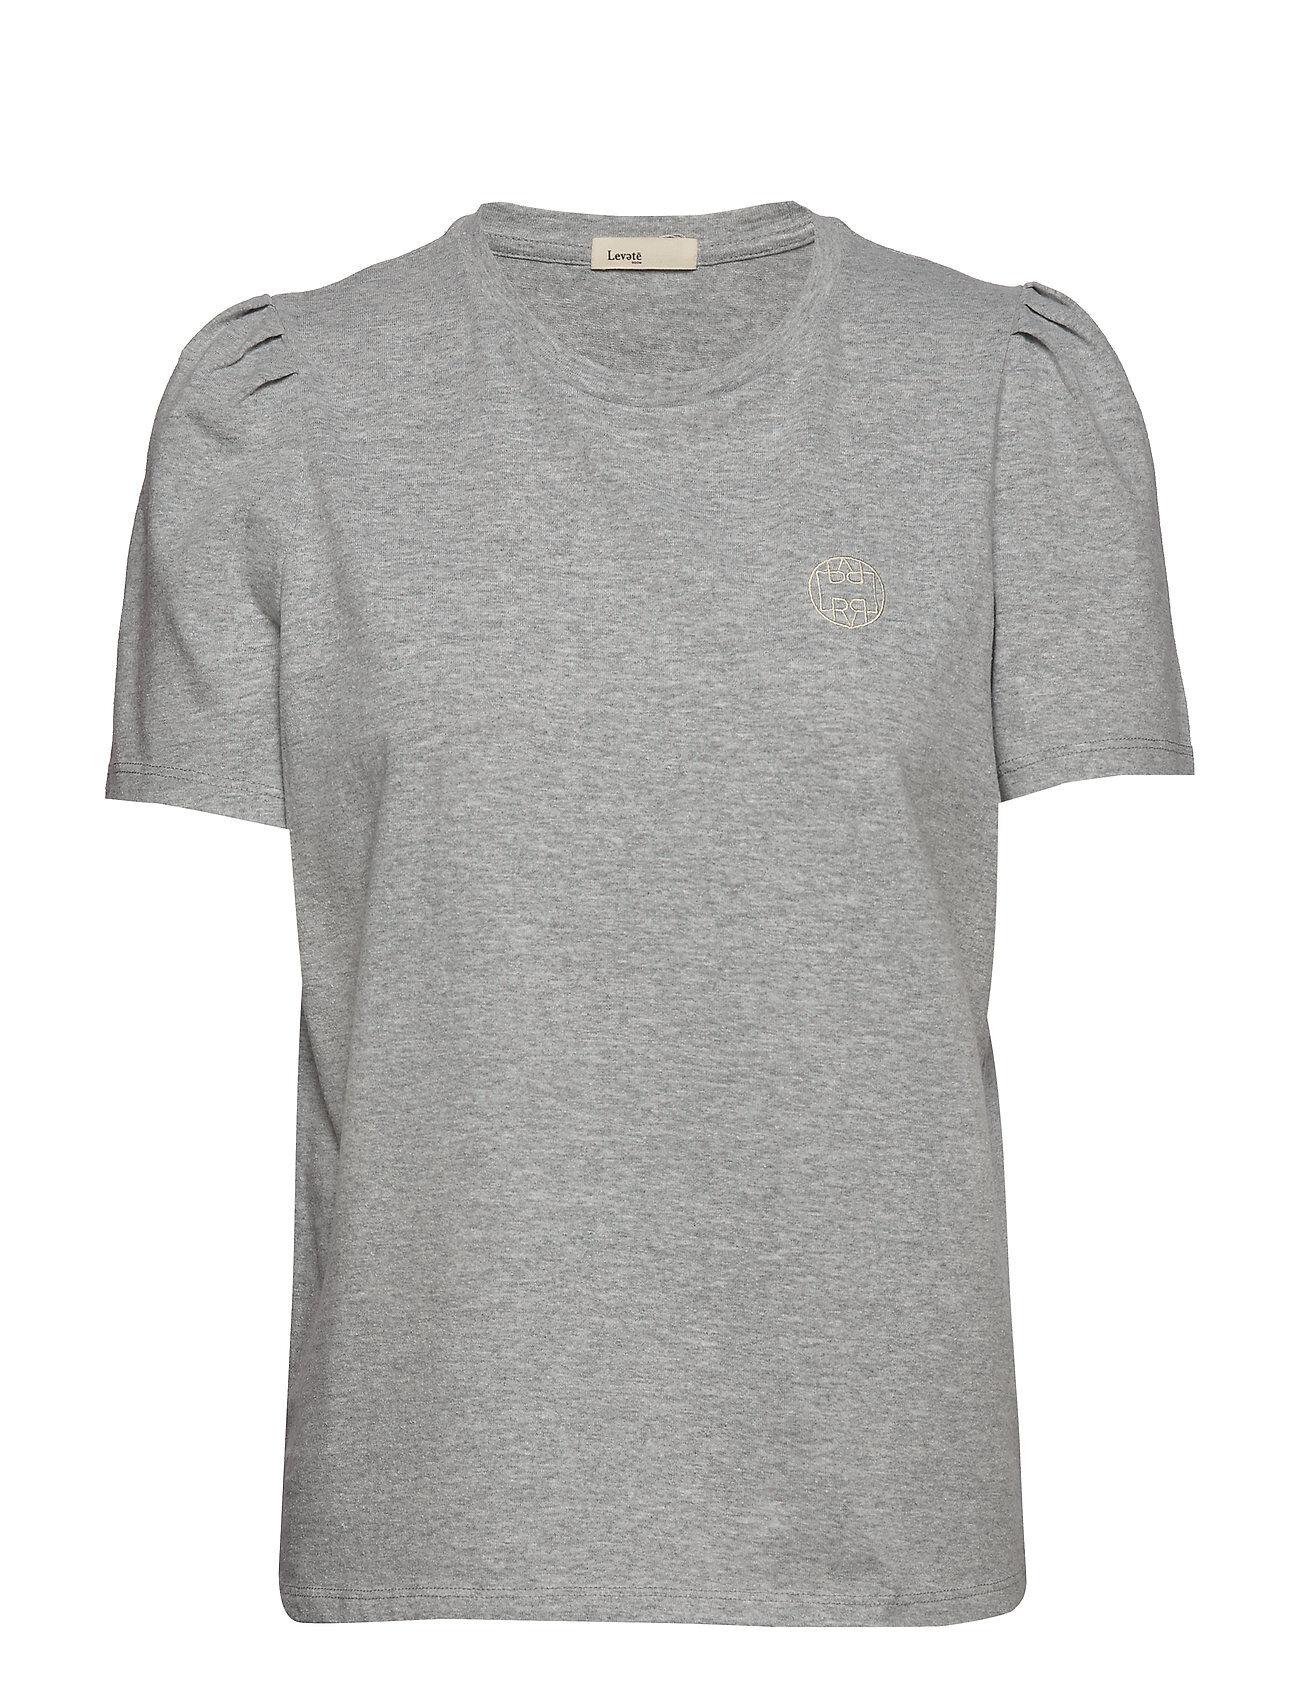 Levete Room Lr-Isol T-shirts & Tops Short-sleeved Harmaa Levete Room